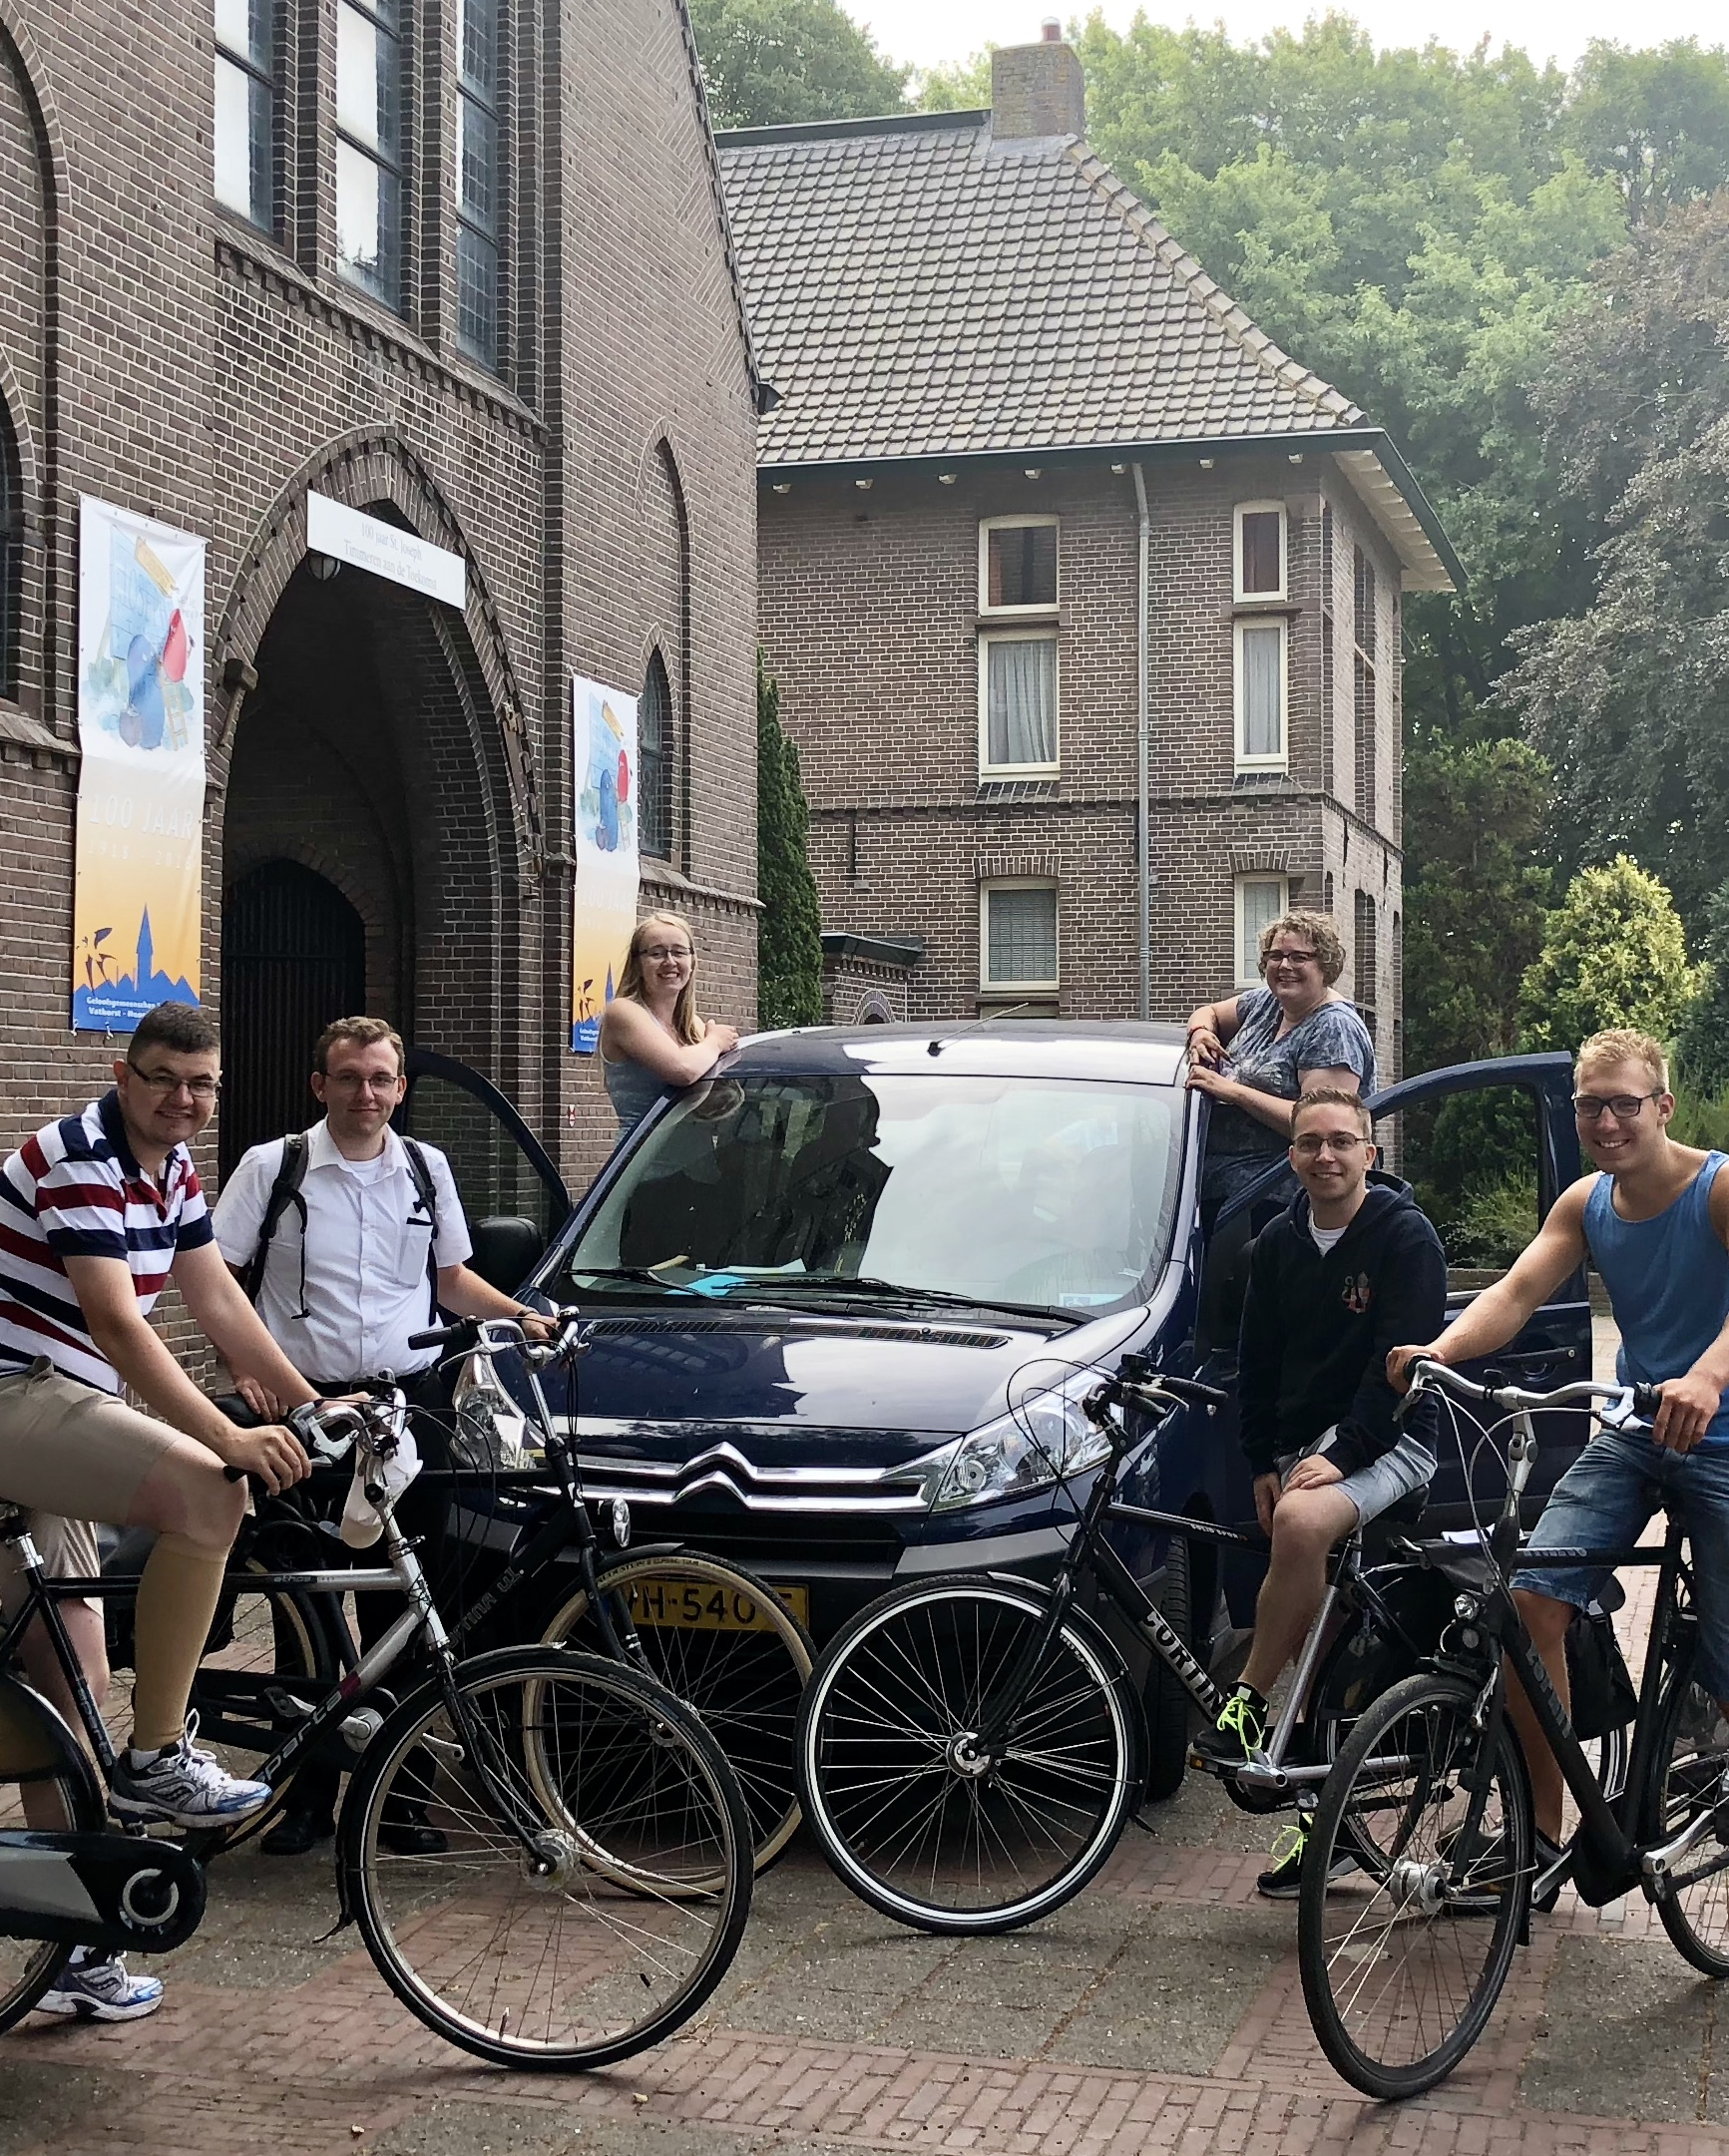 Na de reiszegen stapt de groep op de fiets